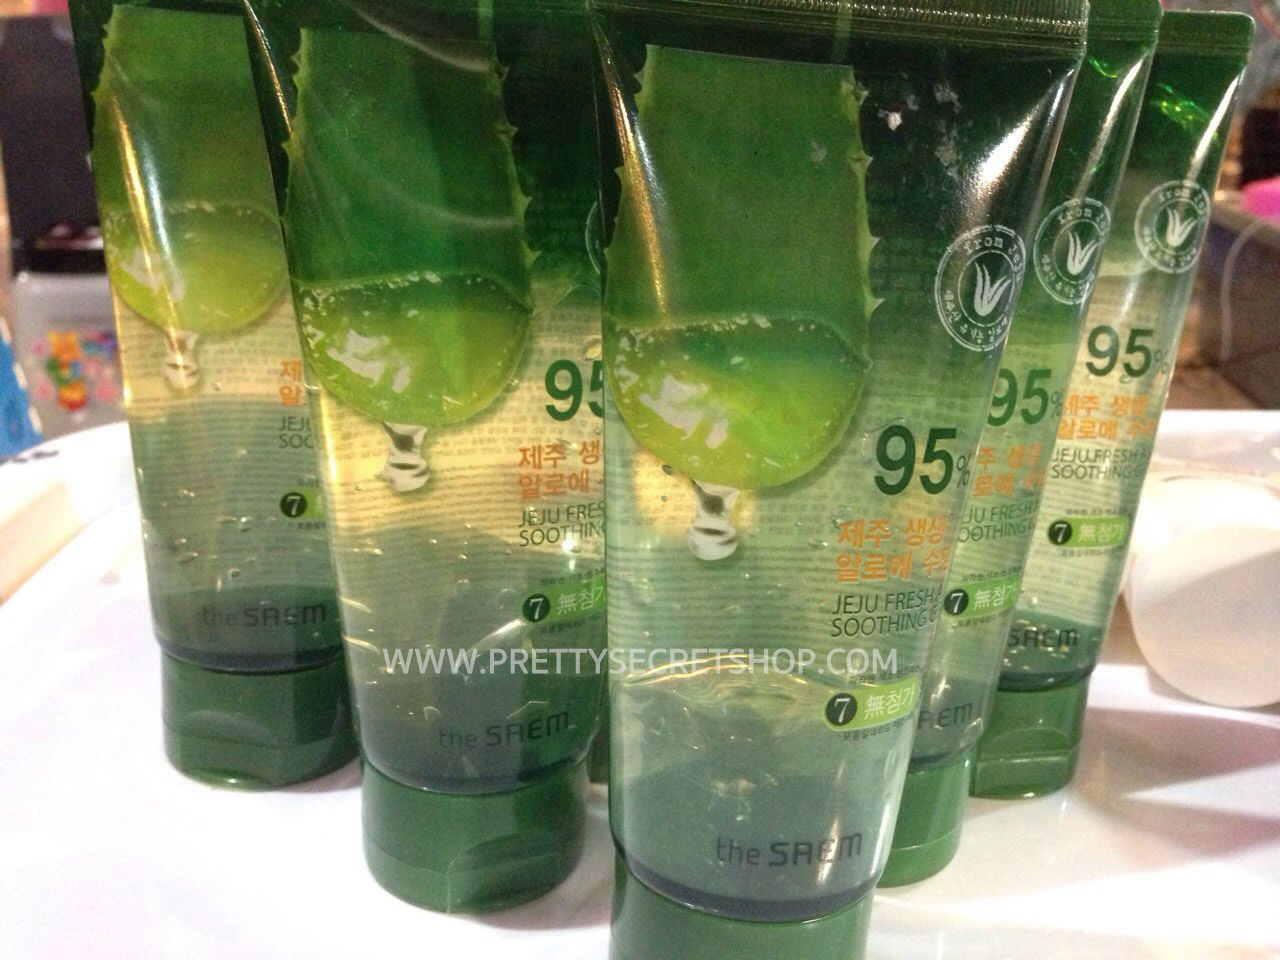 The Saem Jeju Fresh Aloe Soothing Gel 95 120 Ml